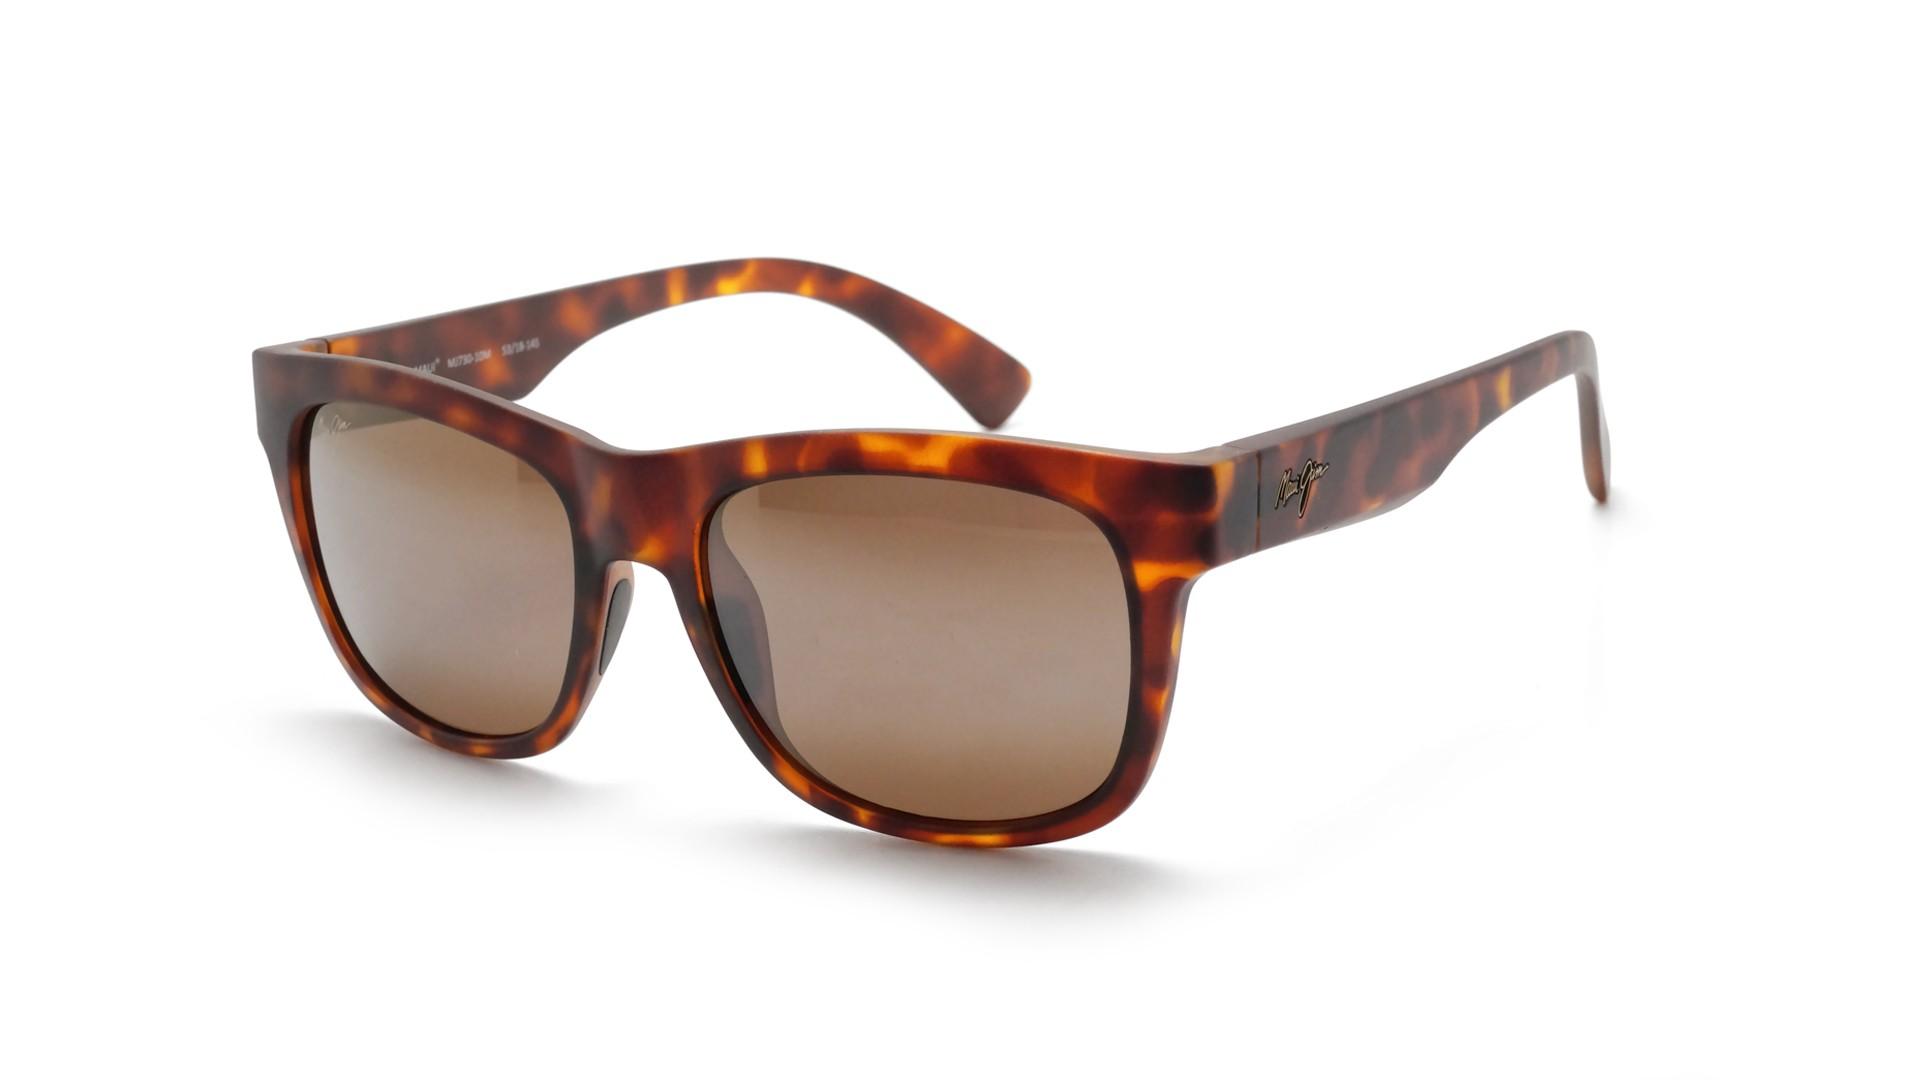 5a637c2eede3 Sunglasses Maui Jim Snapback Tortoise Matte HCL Bronze H730 10M 53-18  Medium Polarized